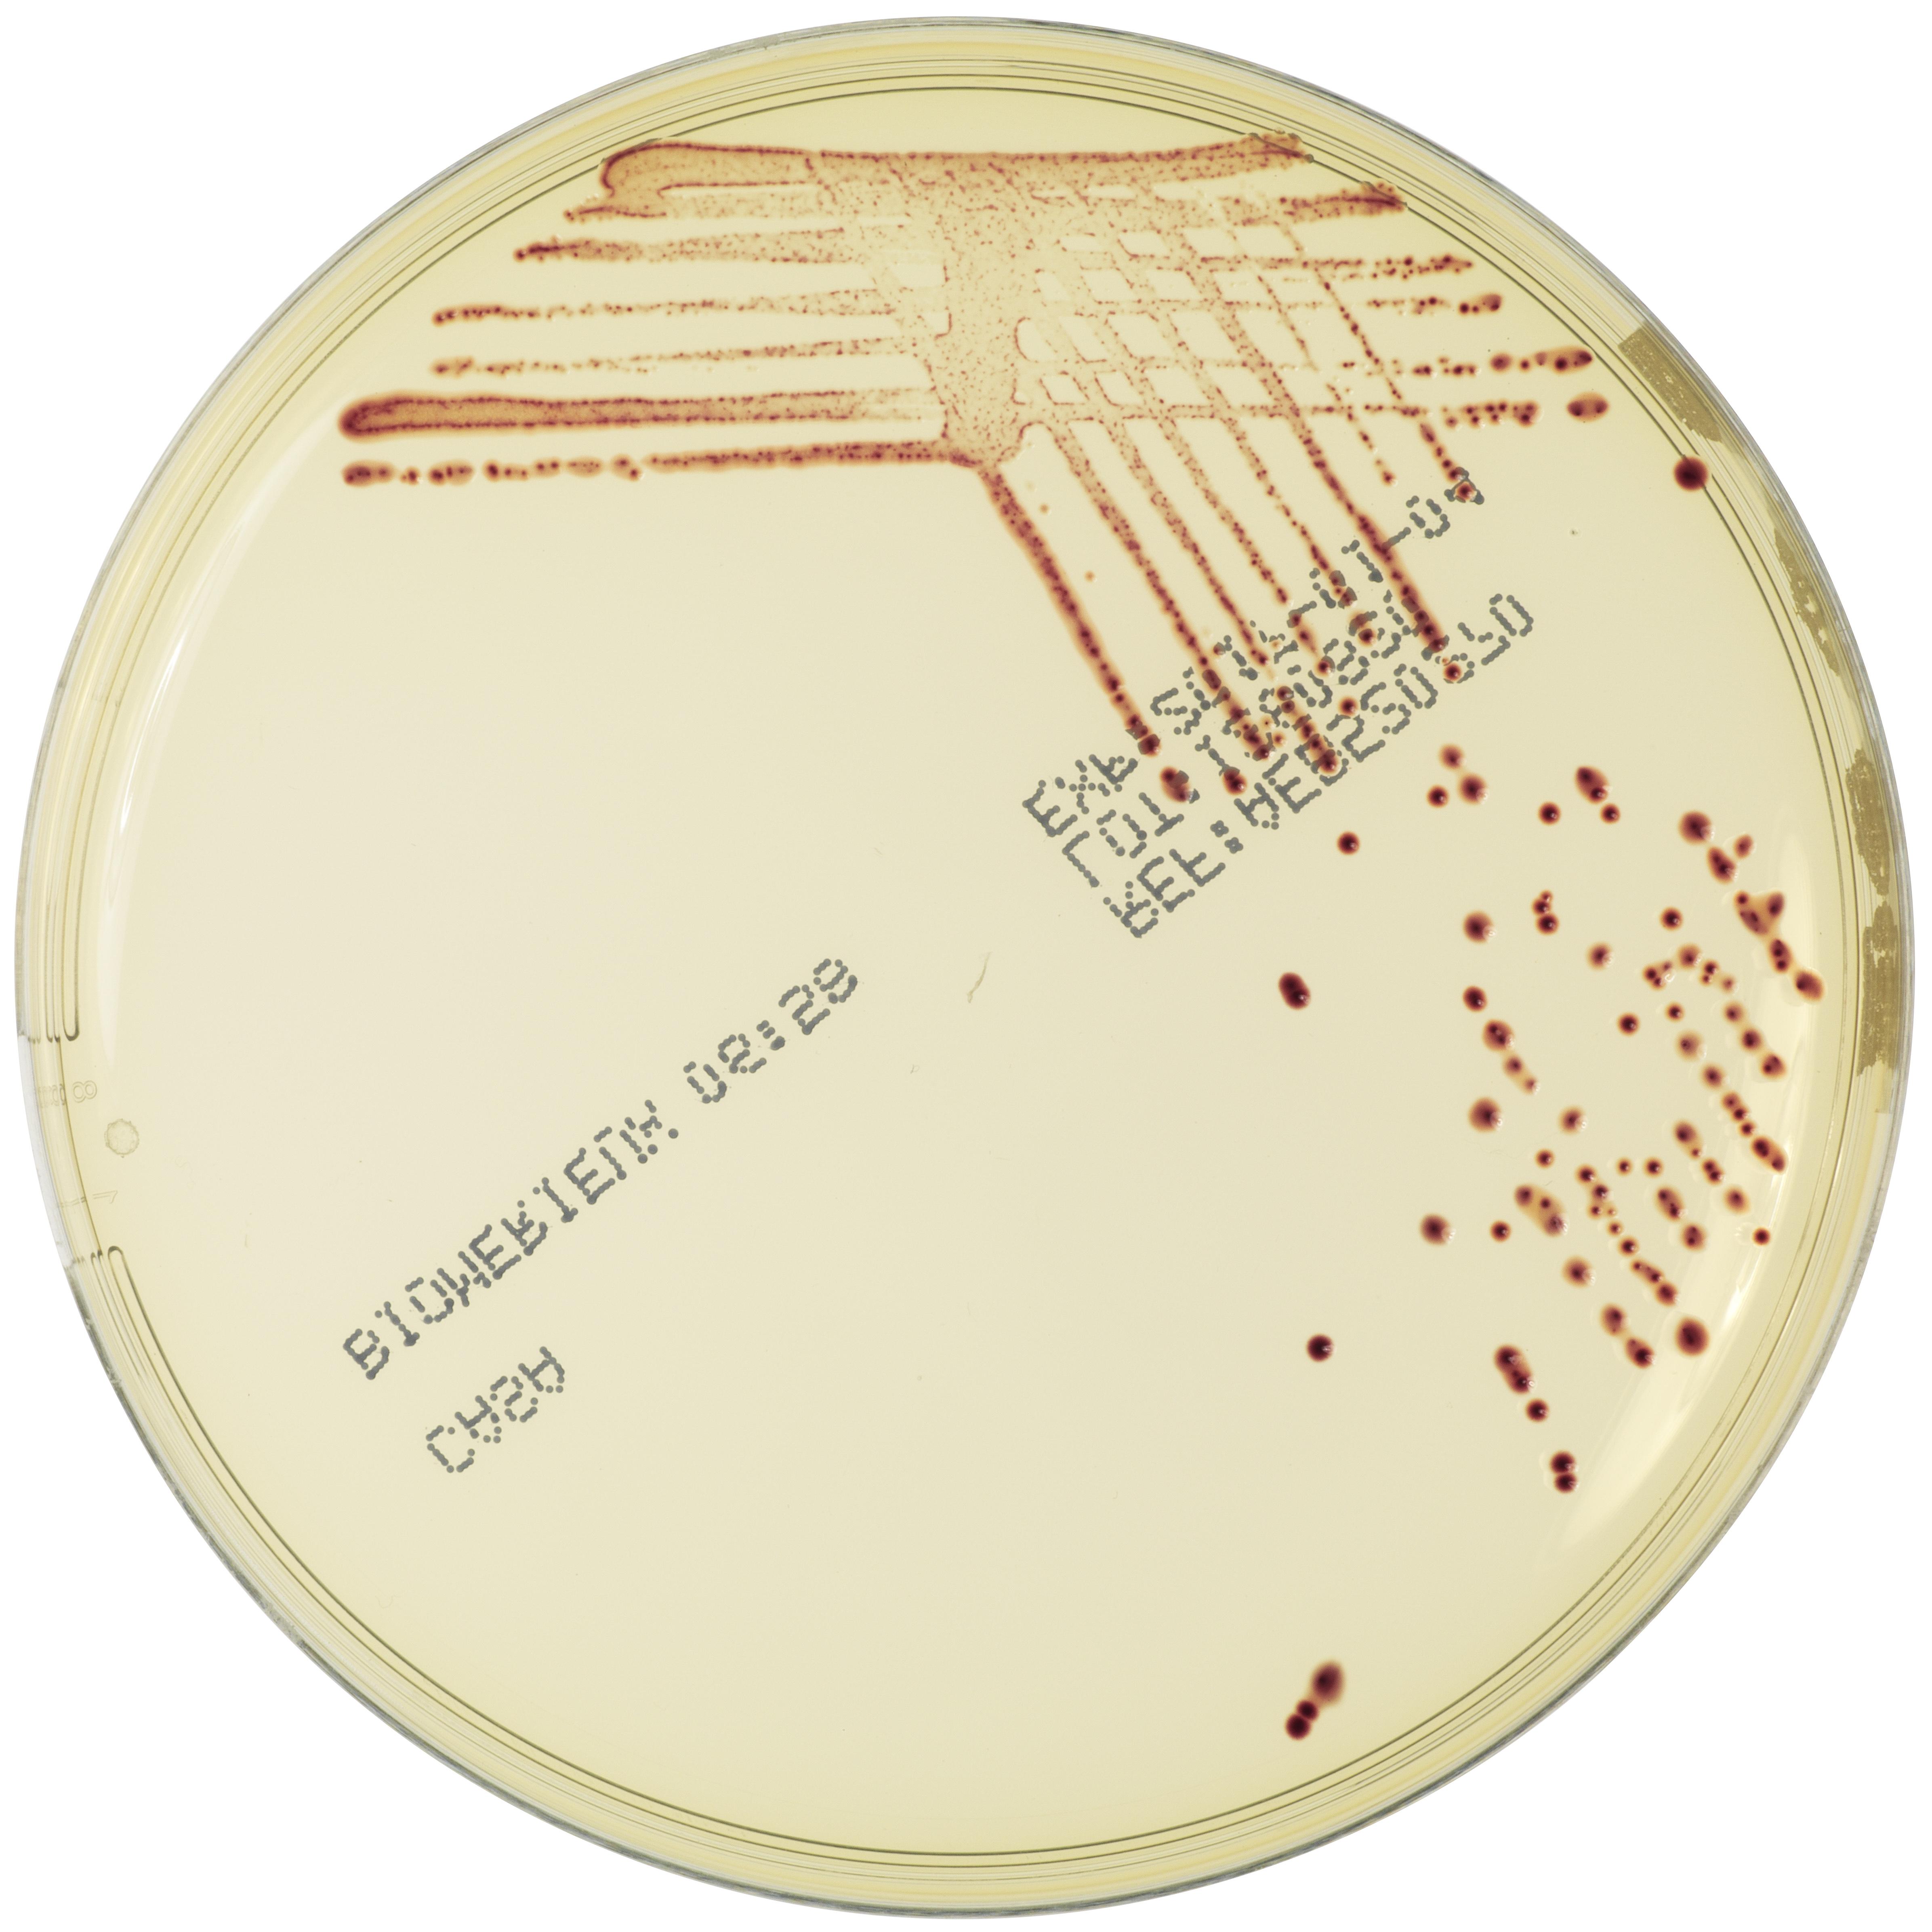 C. coli